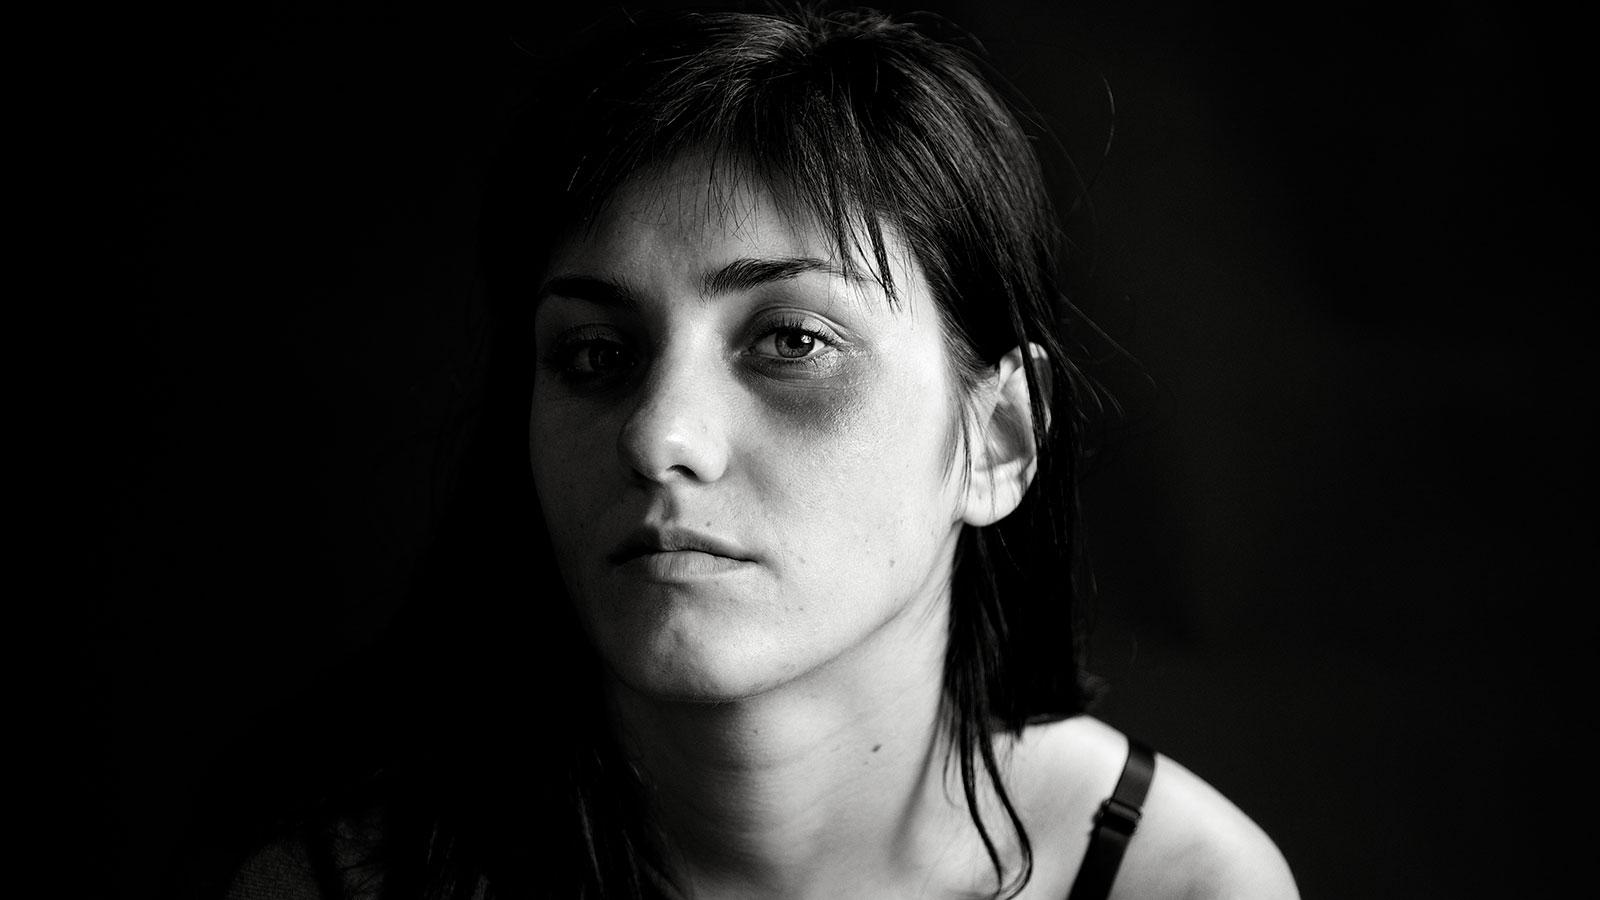 Lo que debes saber sobre la violencia doméstica